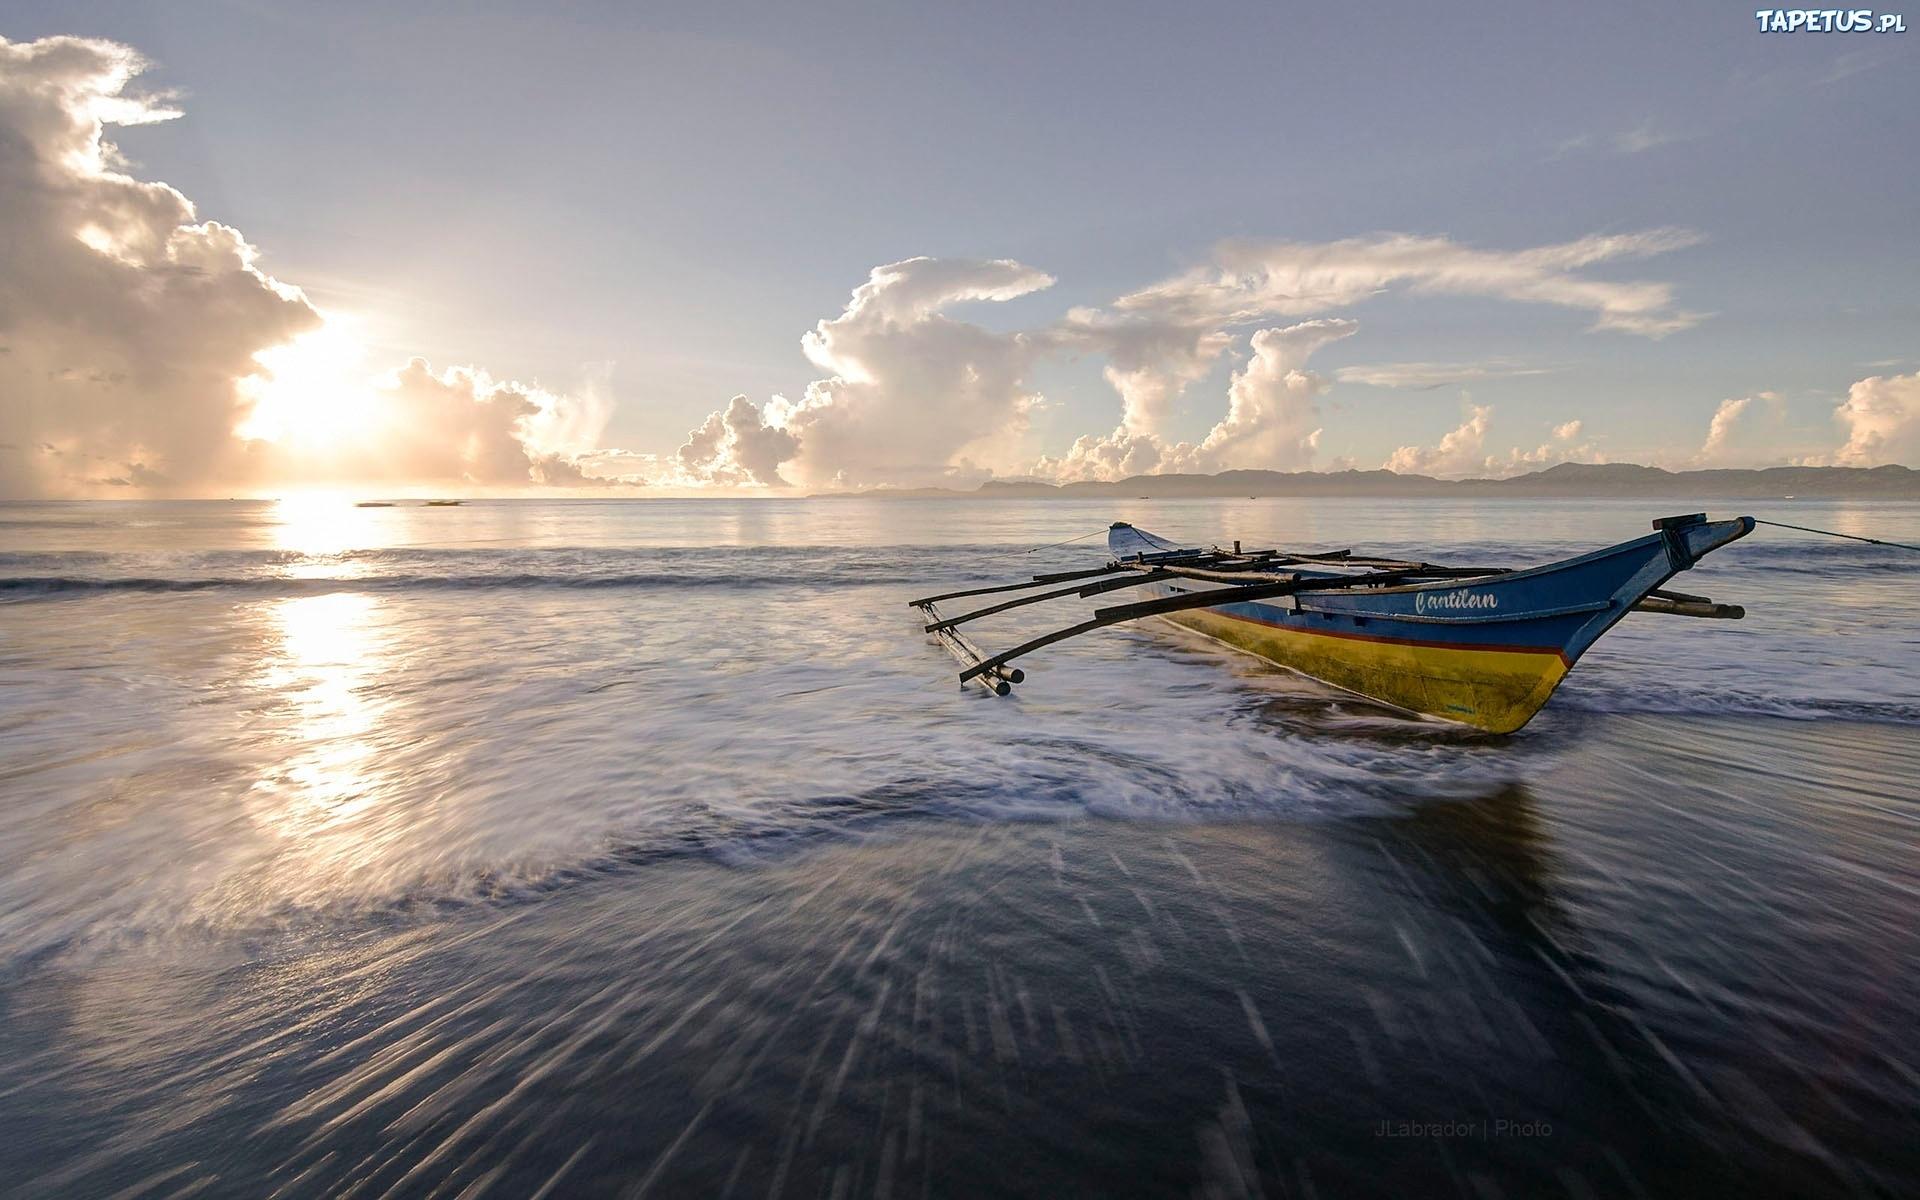 3840x2400 wallpaper ocean boat - photo #5